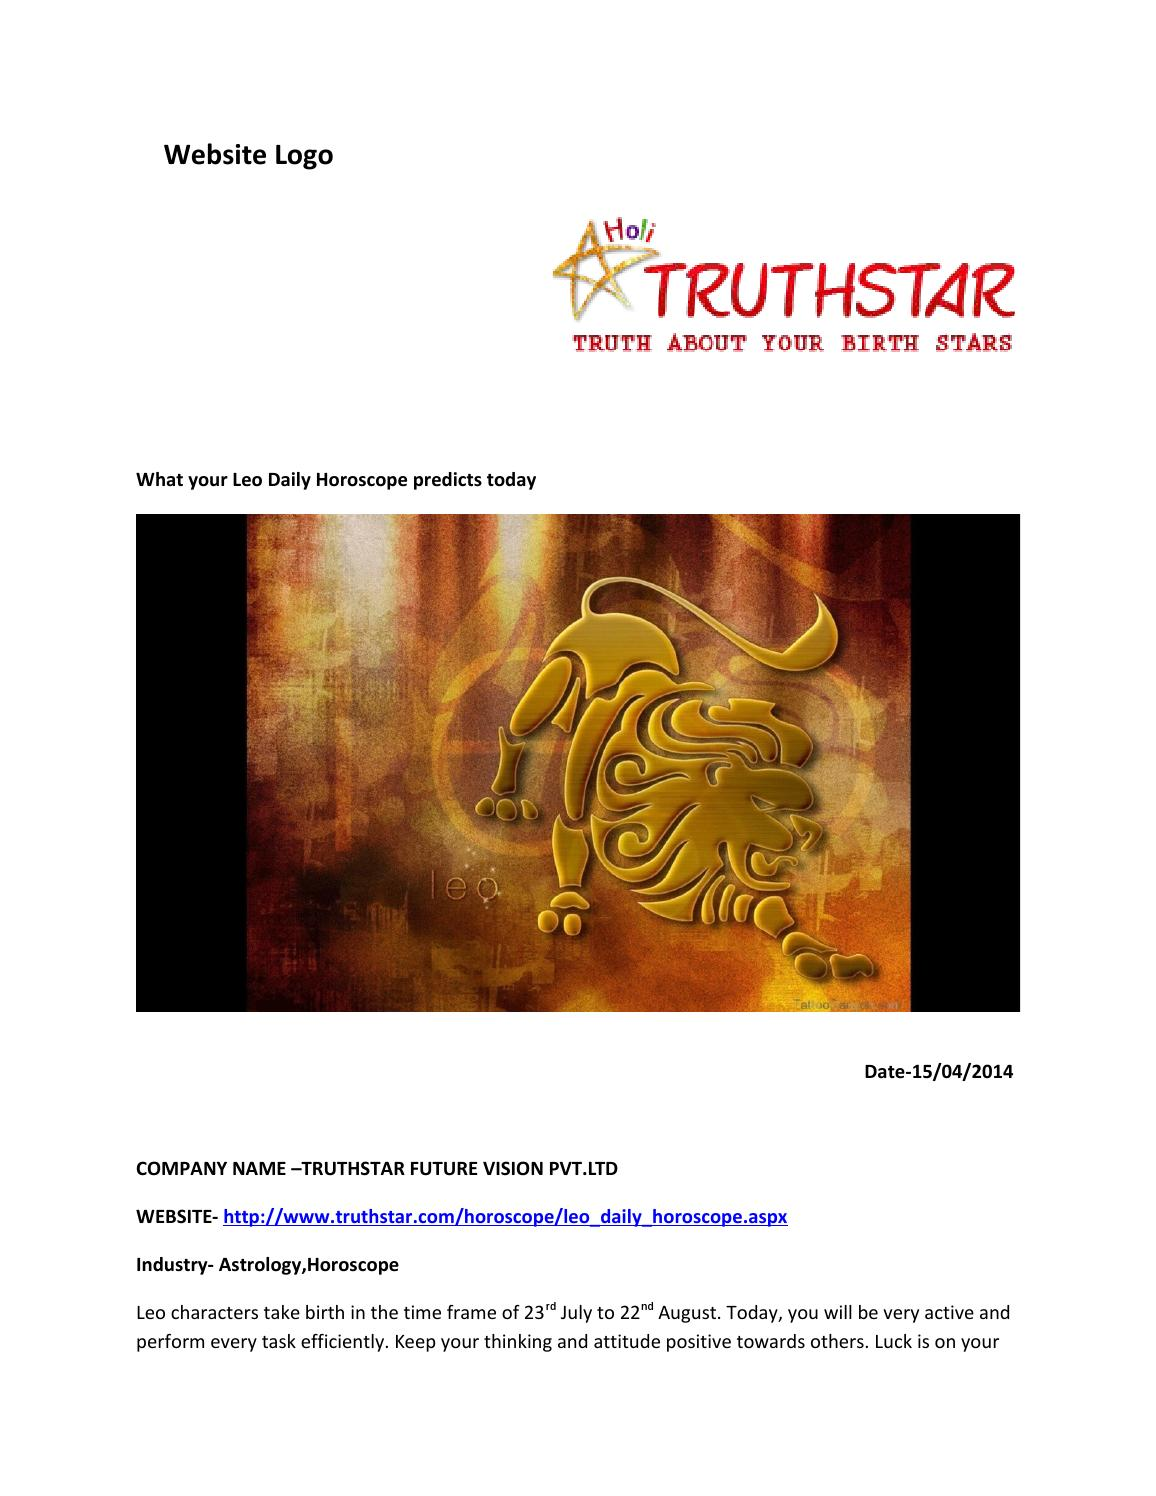 weekly horoscope leo truthstar